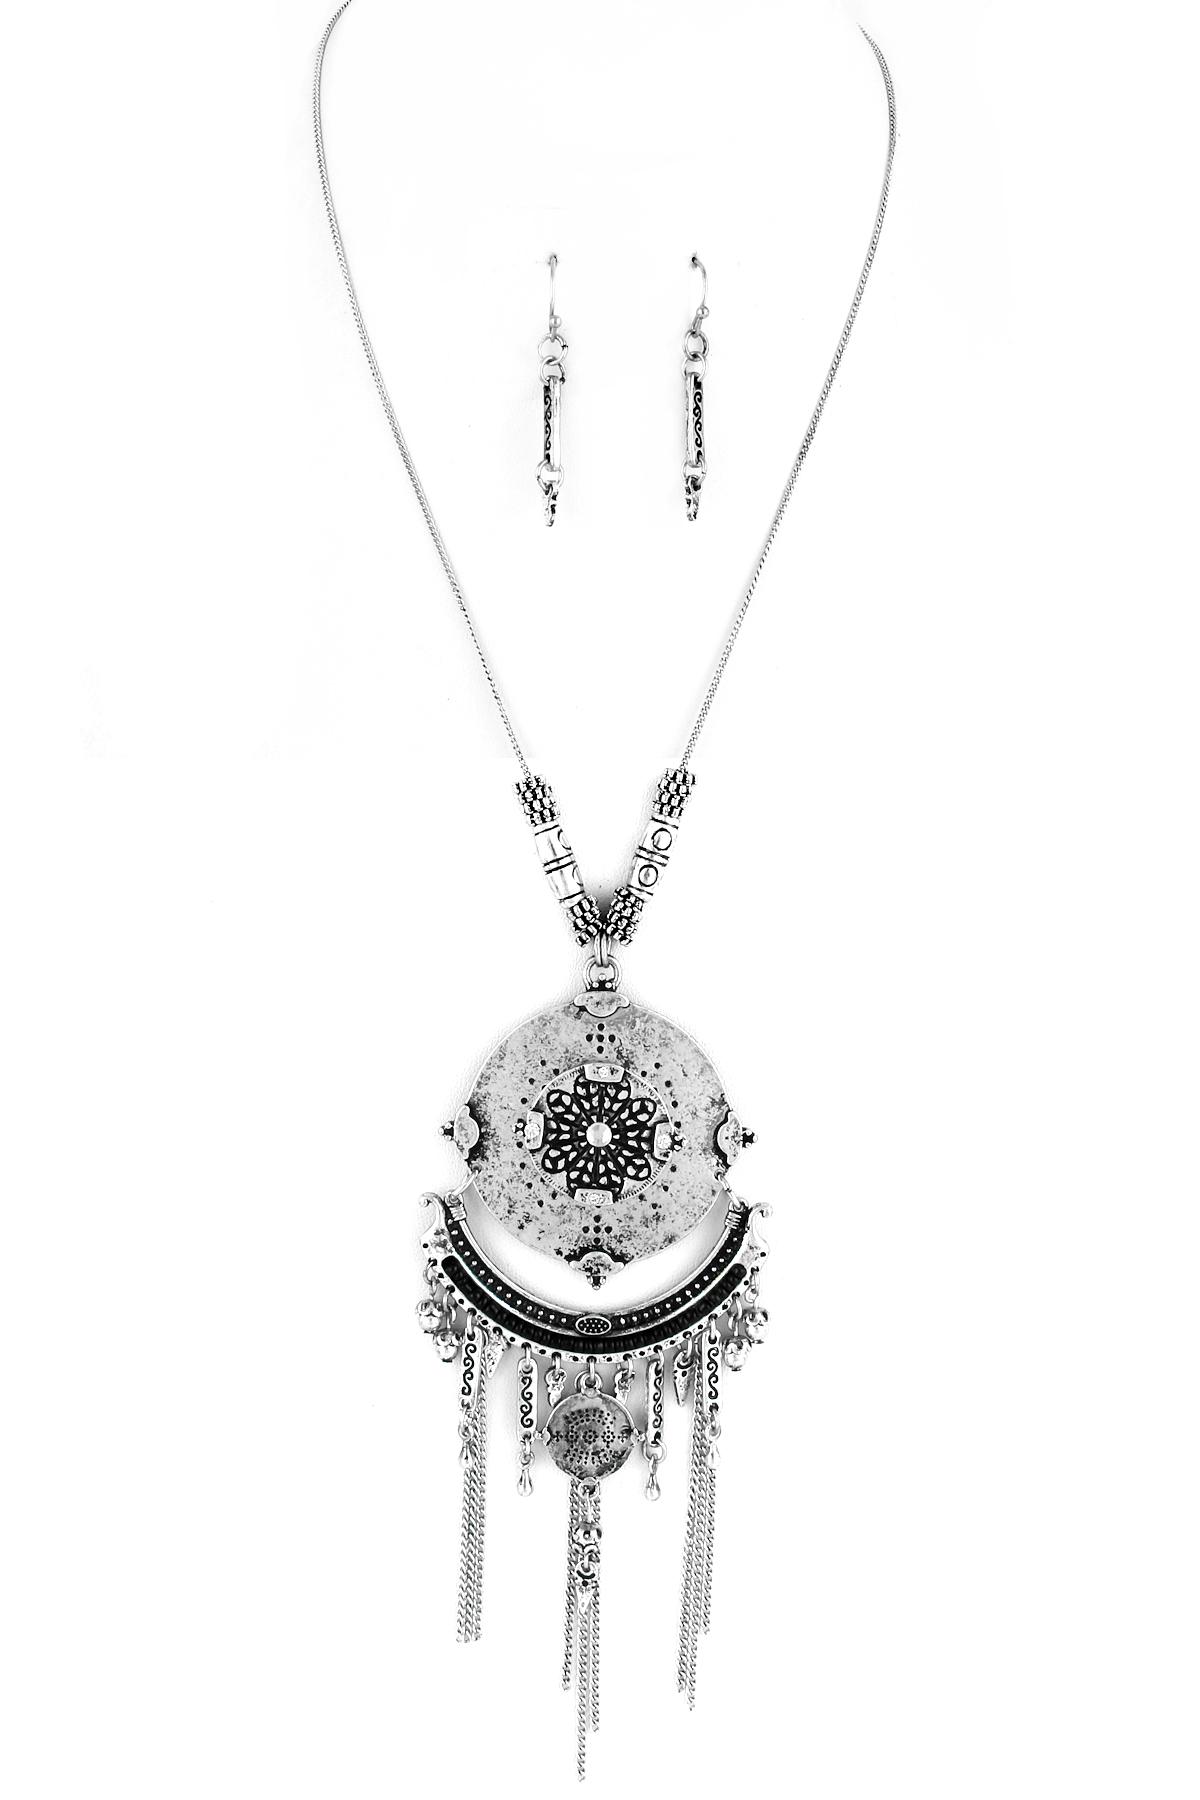 engraved metal floral pendant necklace